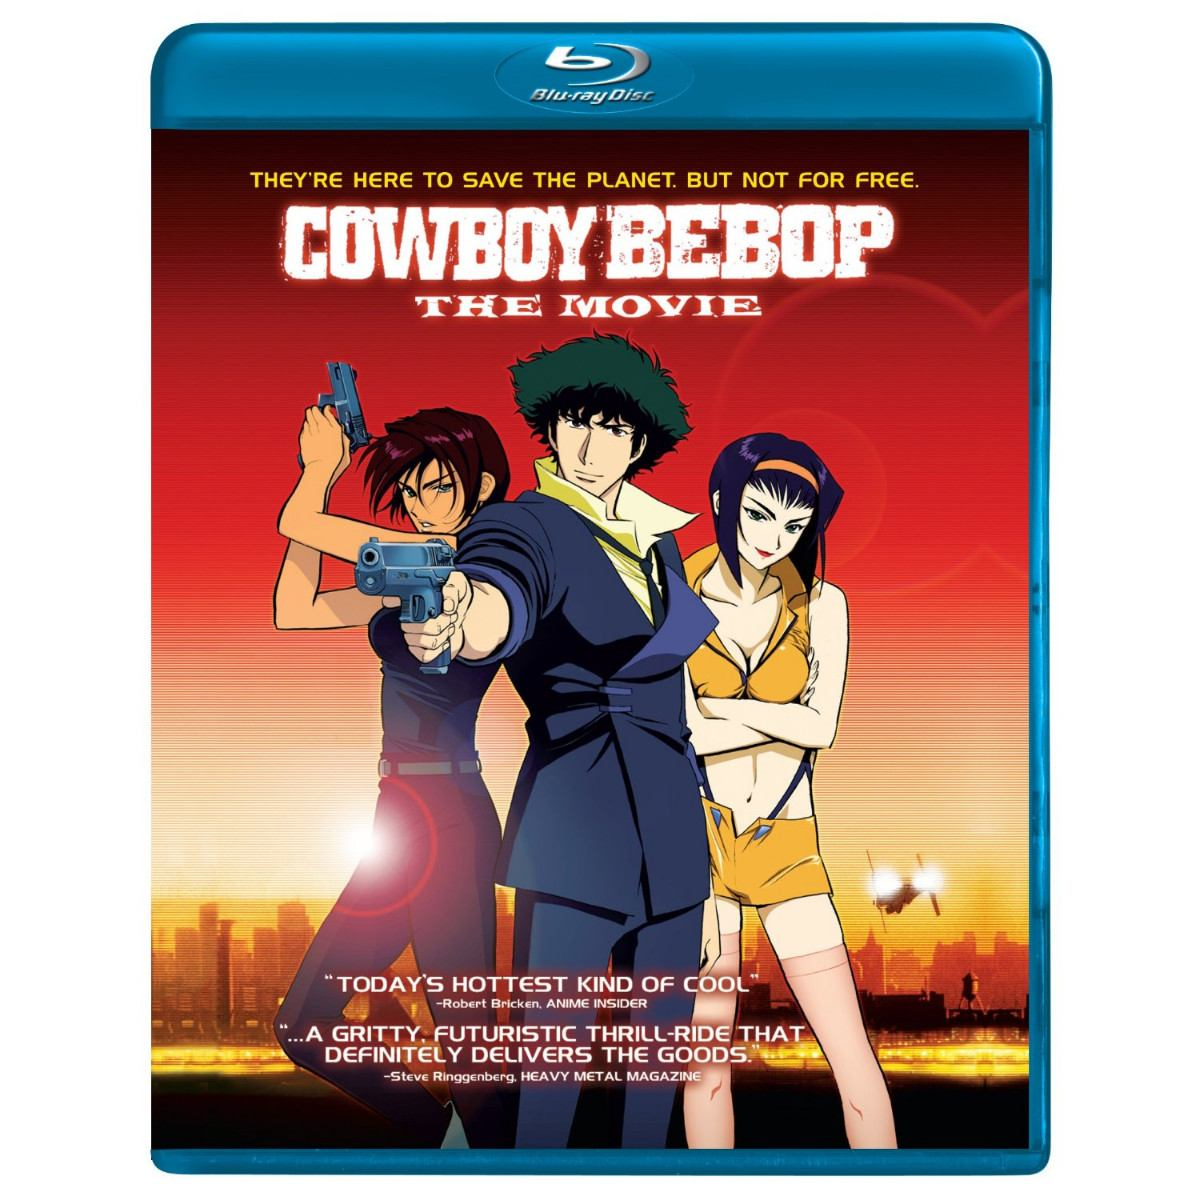 Cowboy Bebop: The Movie 劇場版 カウボーイビバップ 天国の扉 (Gekijoban Kauboi Bibappu: Tengoku no Tobira)